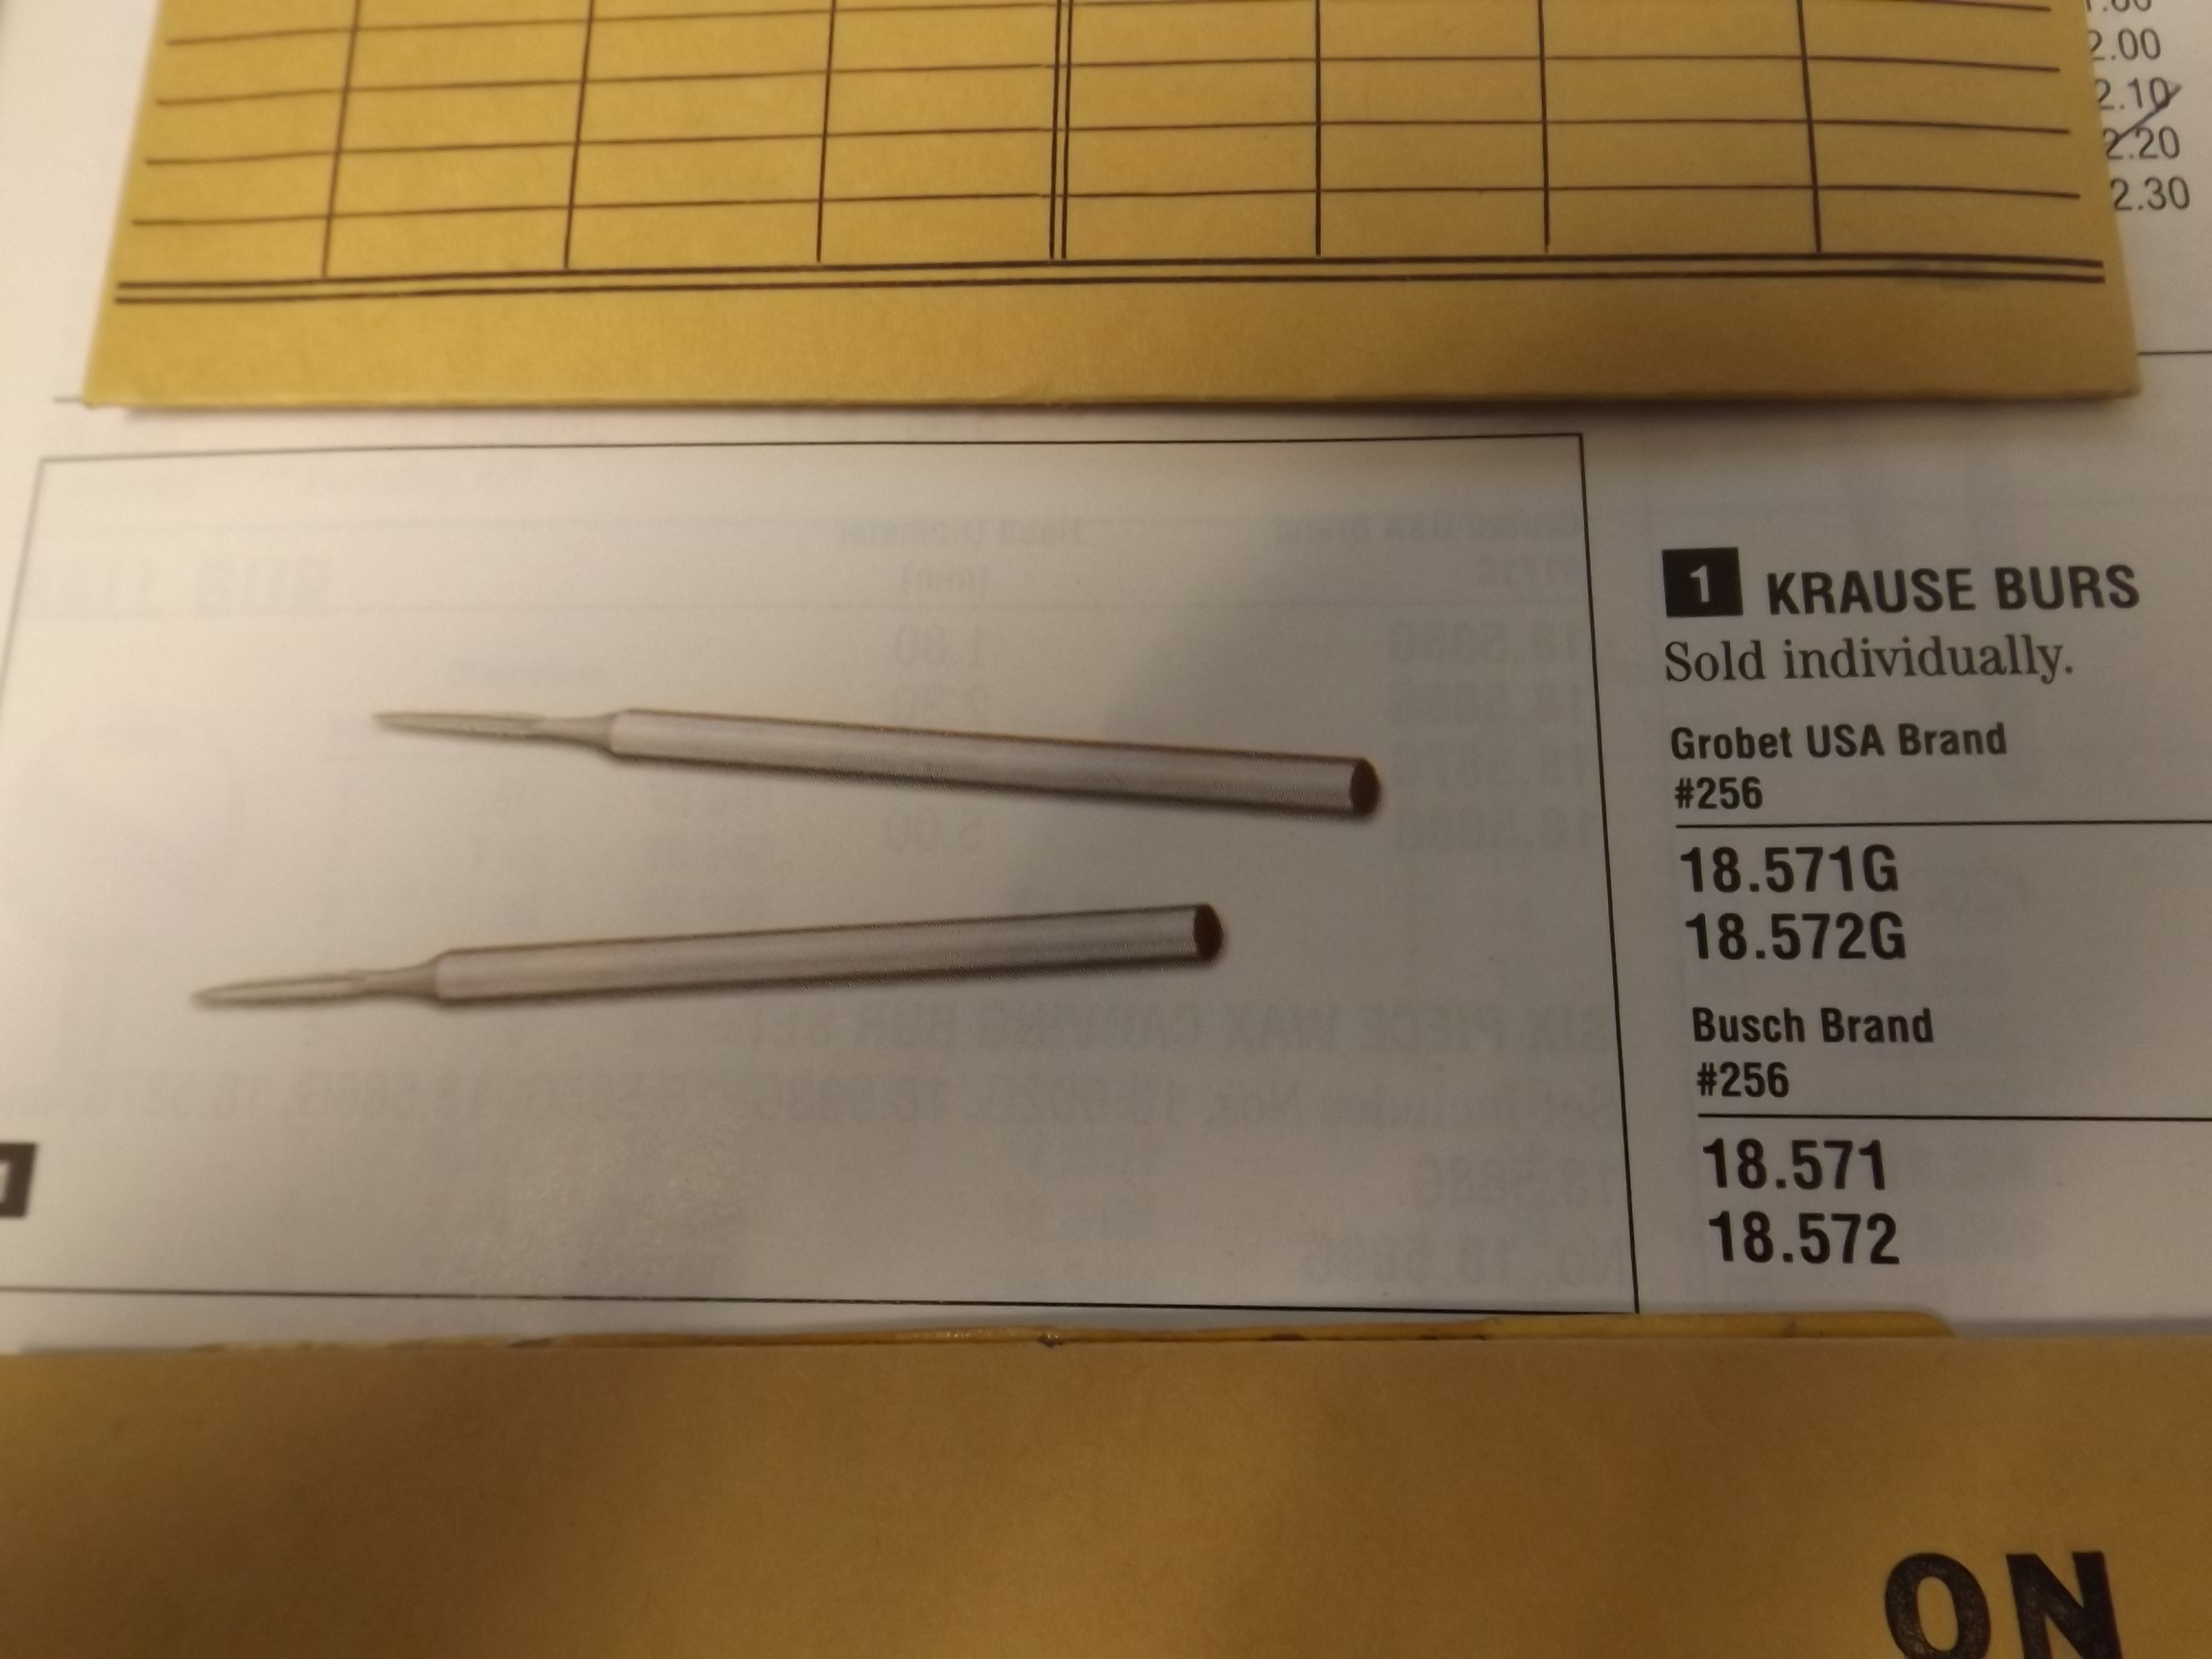 BR18.572G Krause Burs- Grobet Brand--4 pieces left!